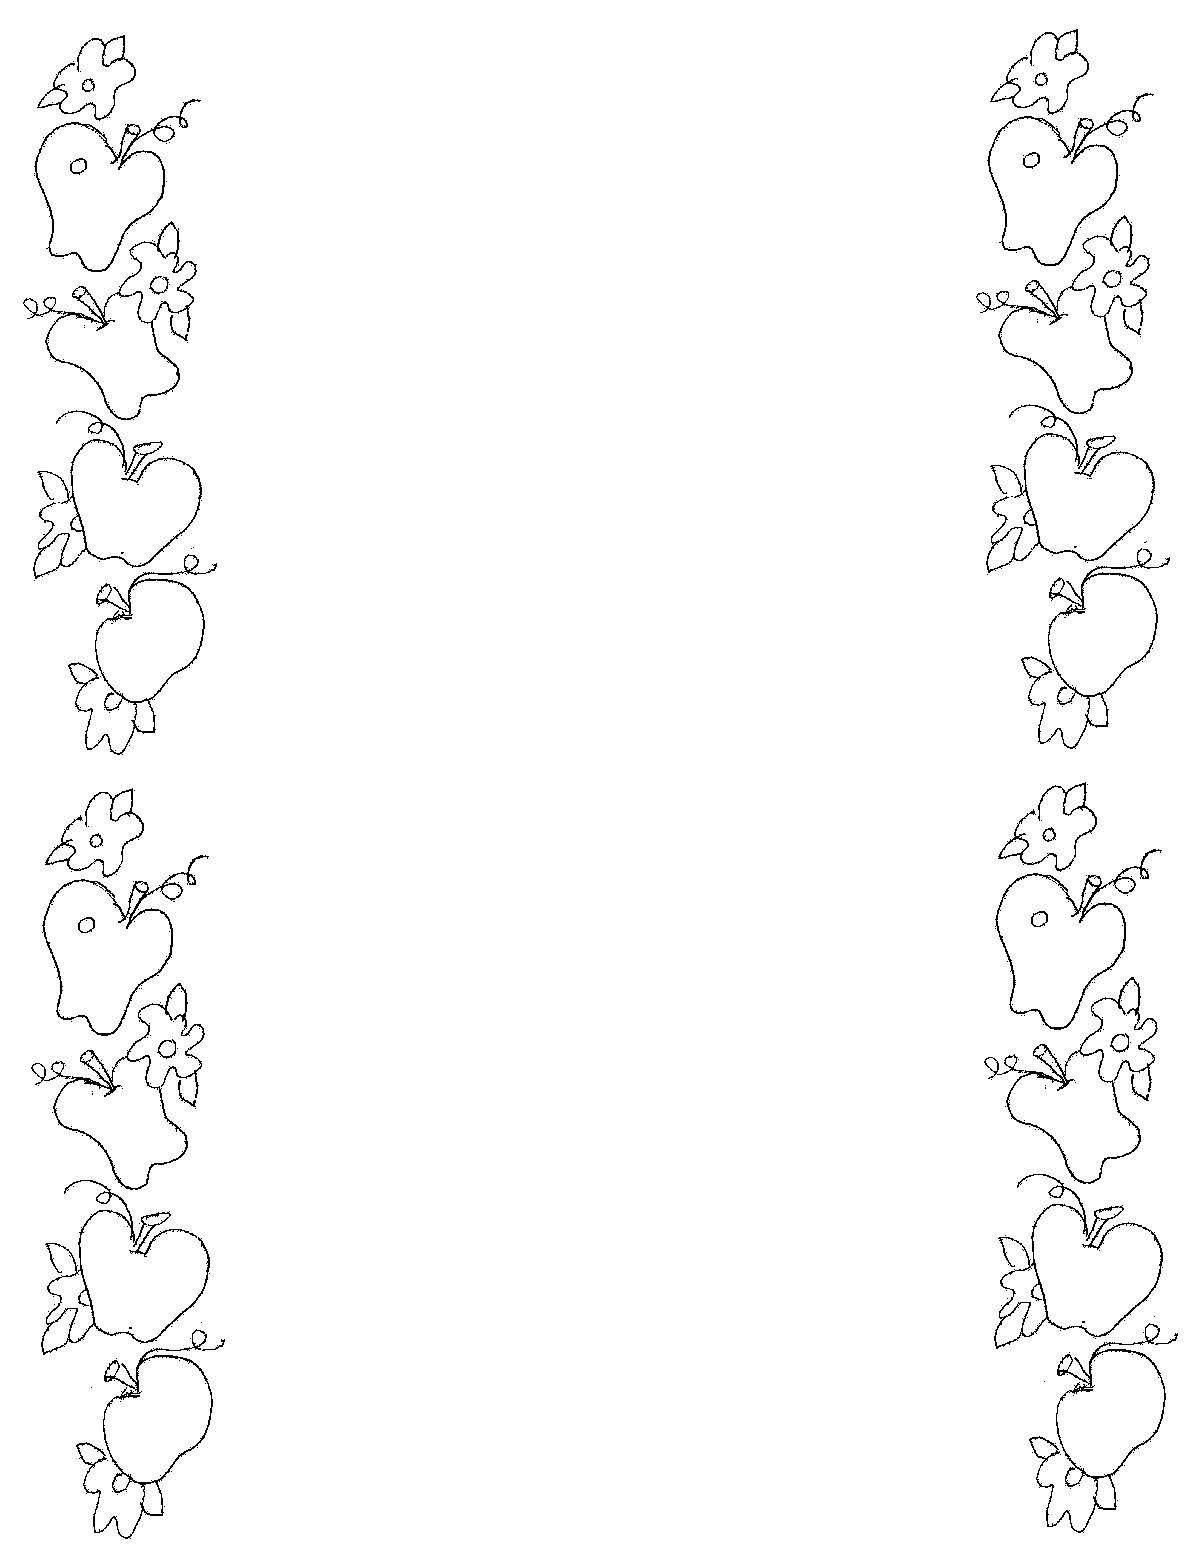 Free Free Apple Borders, Download Free Clip Art, Free Clip.